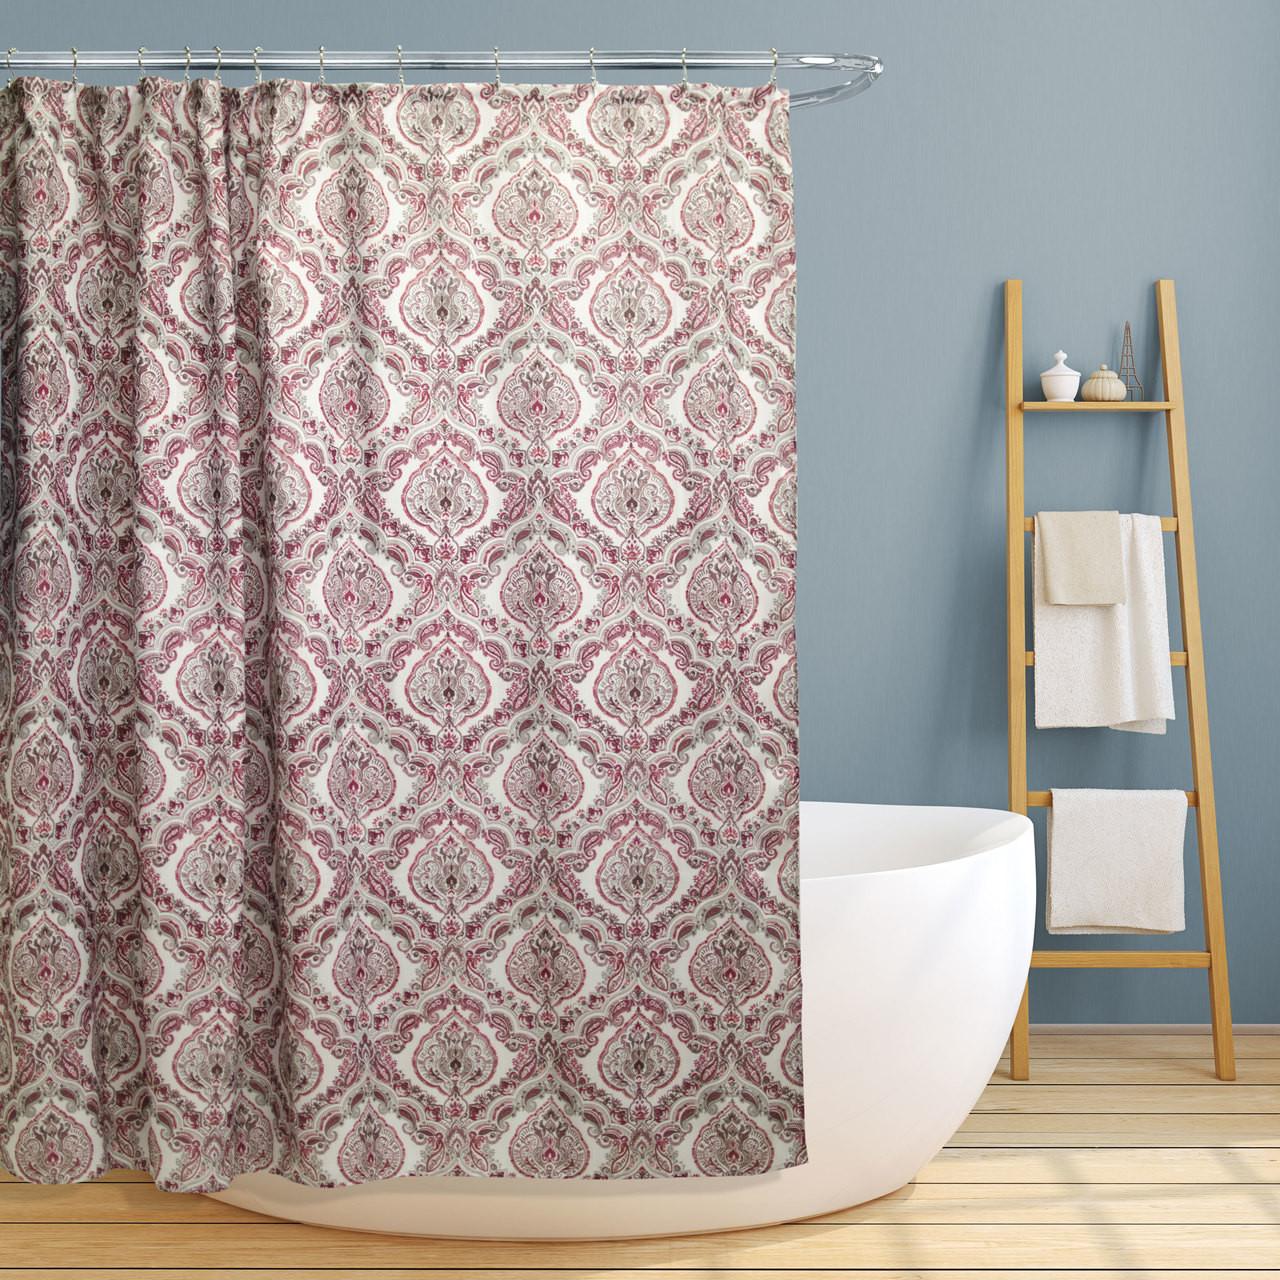 Fabric Canvas Shower Curtain 70 X70 Rose Burgundy Paisley Damask Design